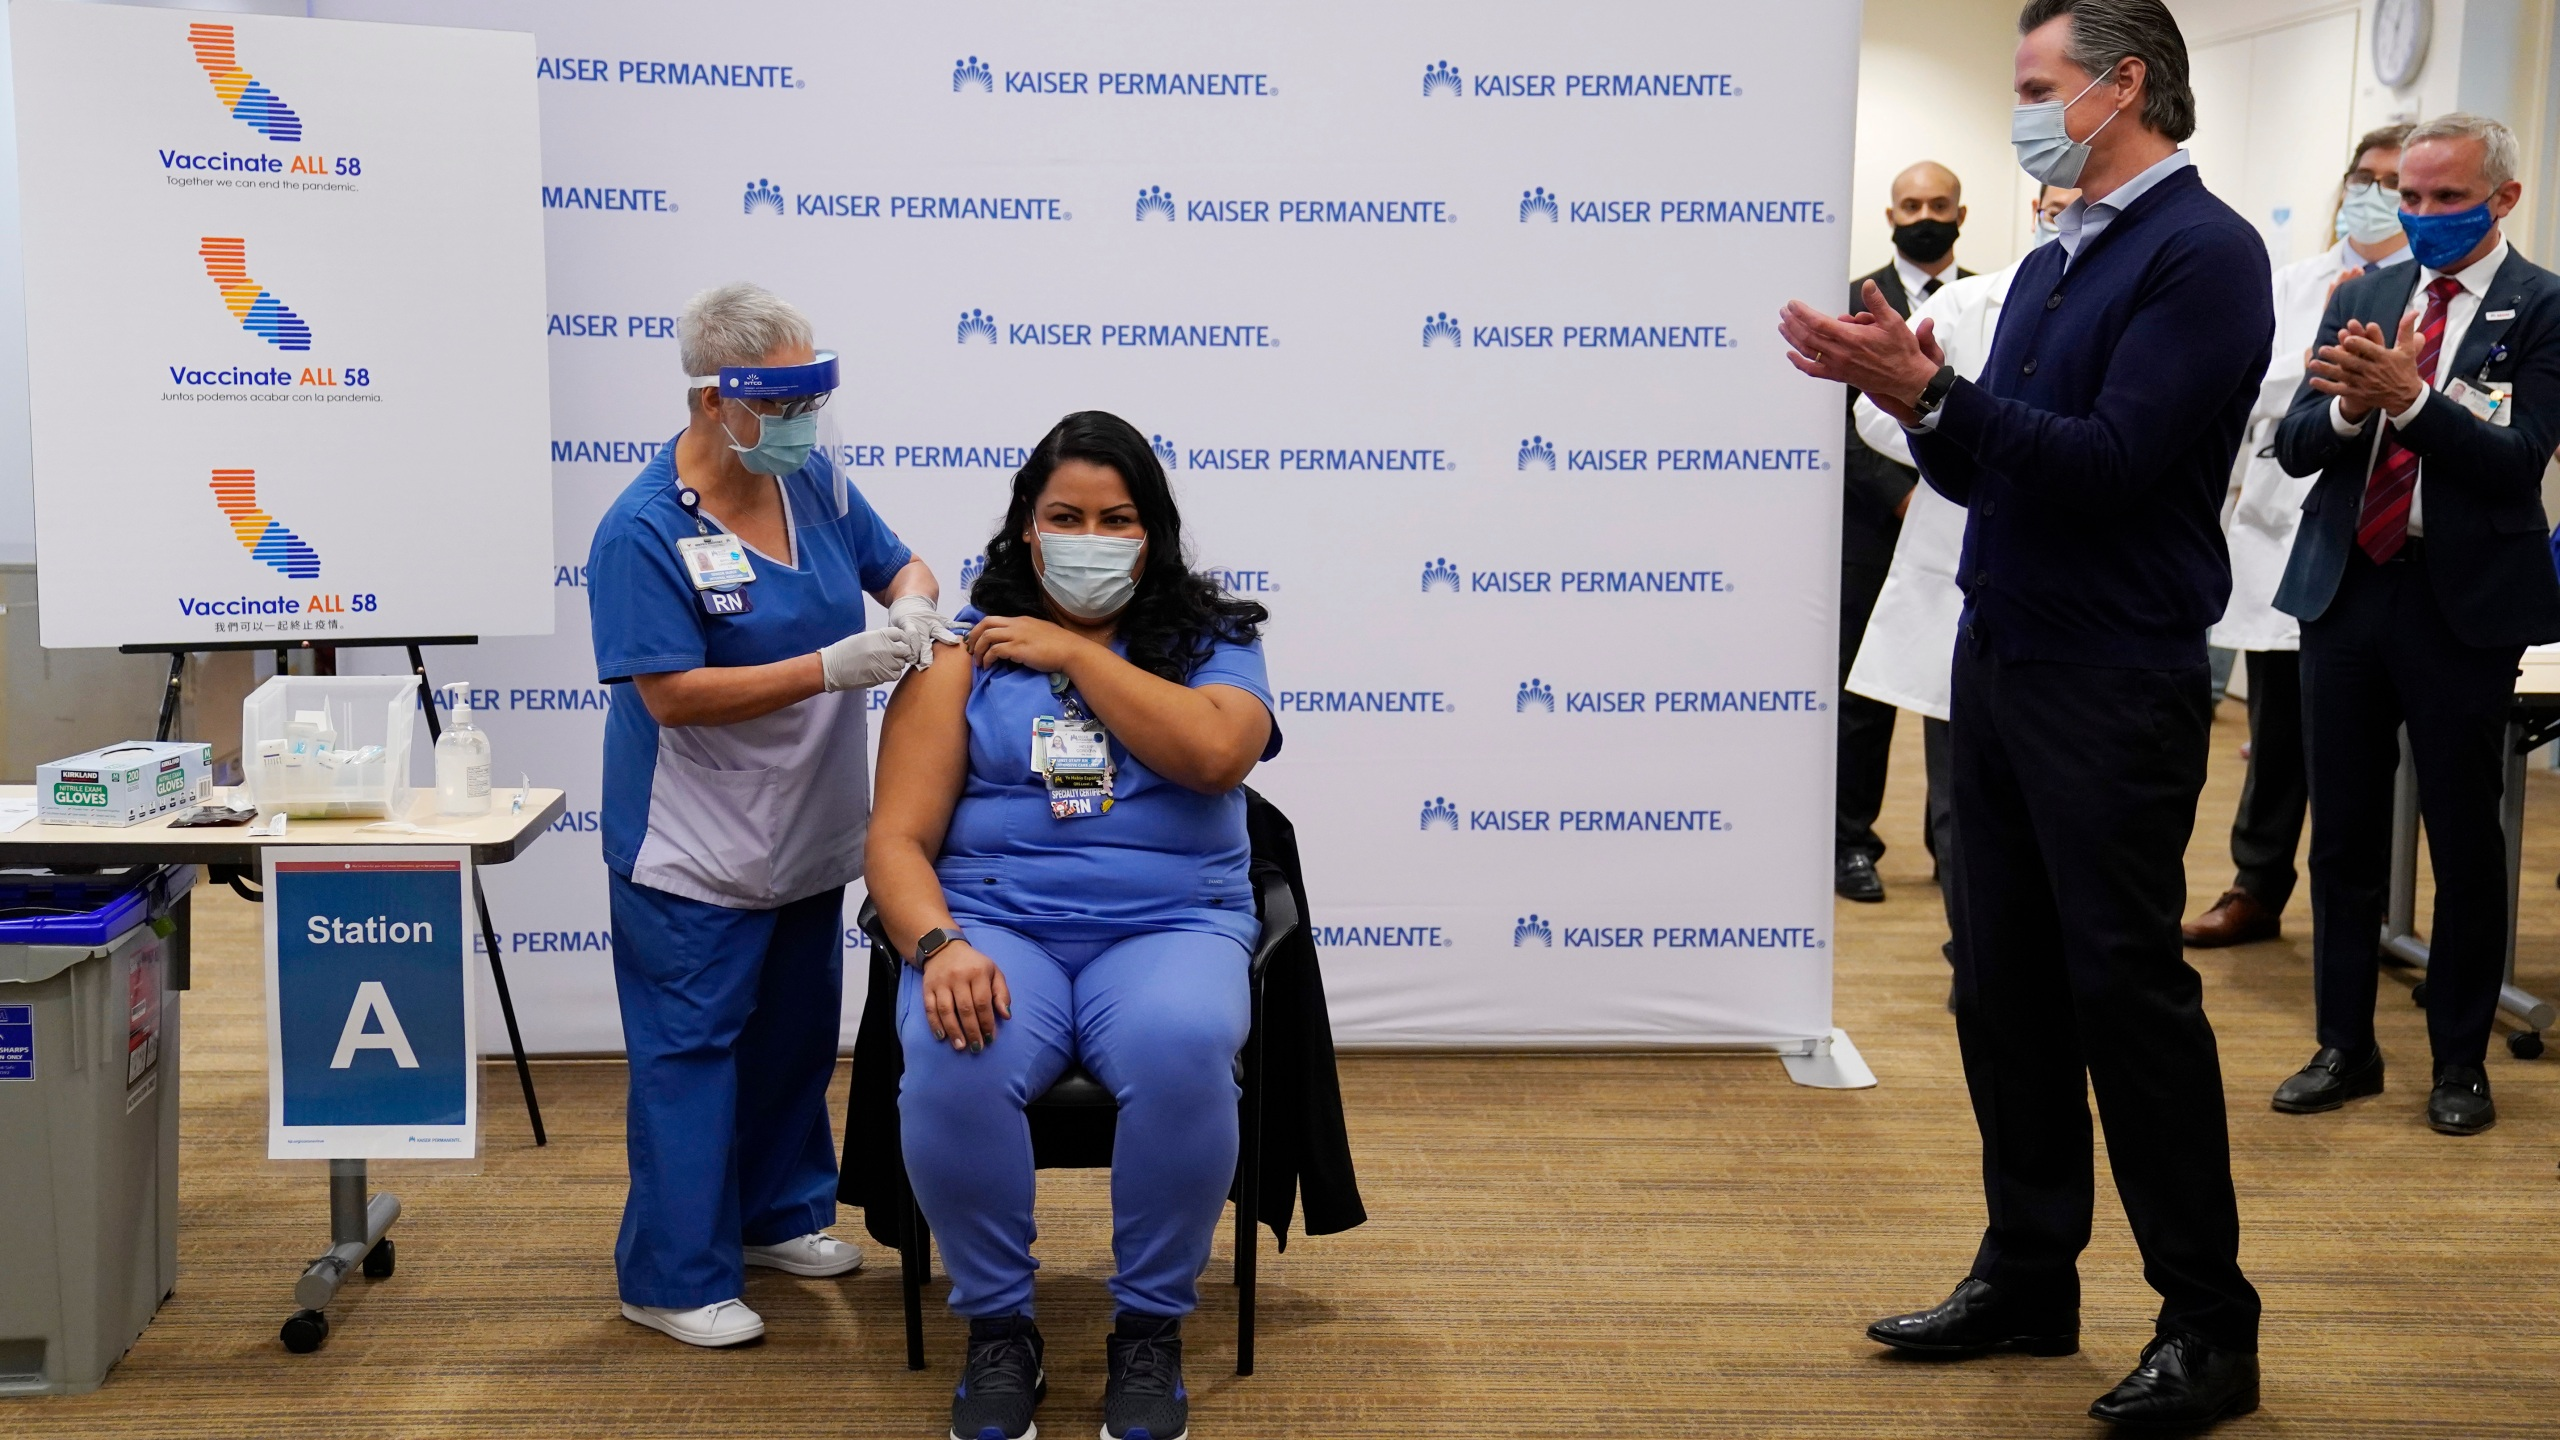 Gov. Gavin Newsom watches as ICU nurse Helen Cordova receives the Pfizer-BioNTech COVID-19 vaccine at Kaiser Permanente Los Angeles Medical Center on Dec. 14, 2020. (Jae C. Hong-Pool/Getty Images)